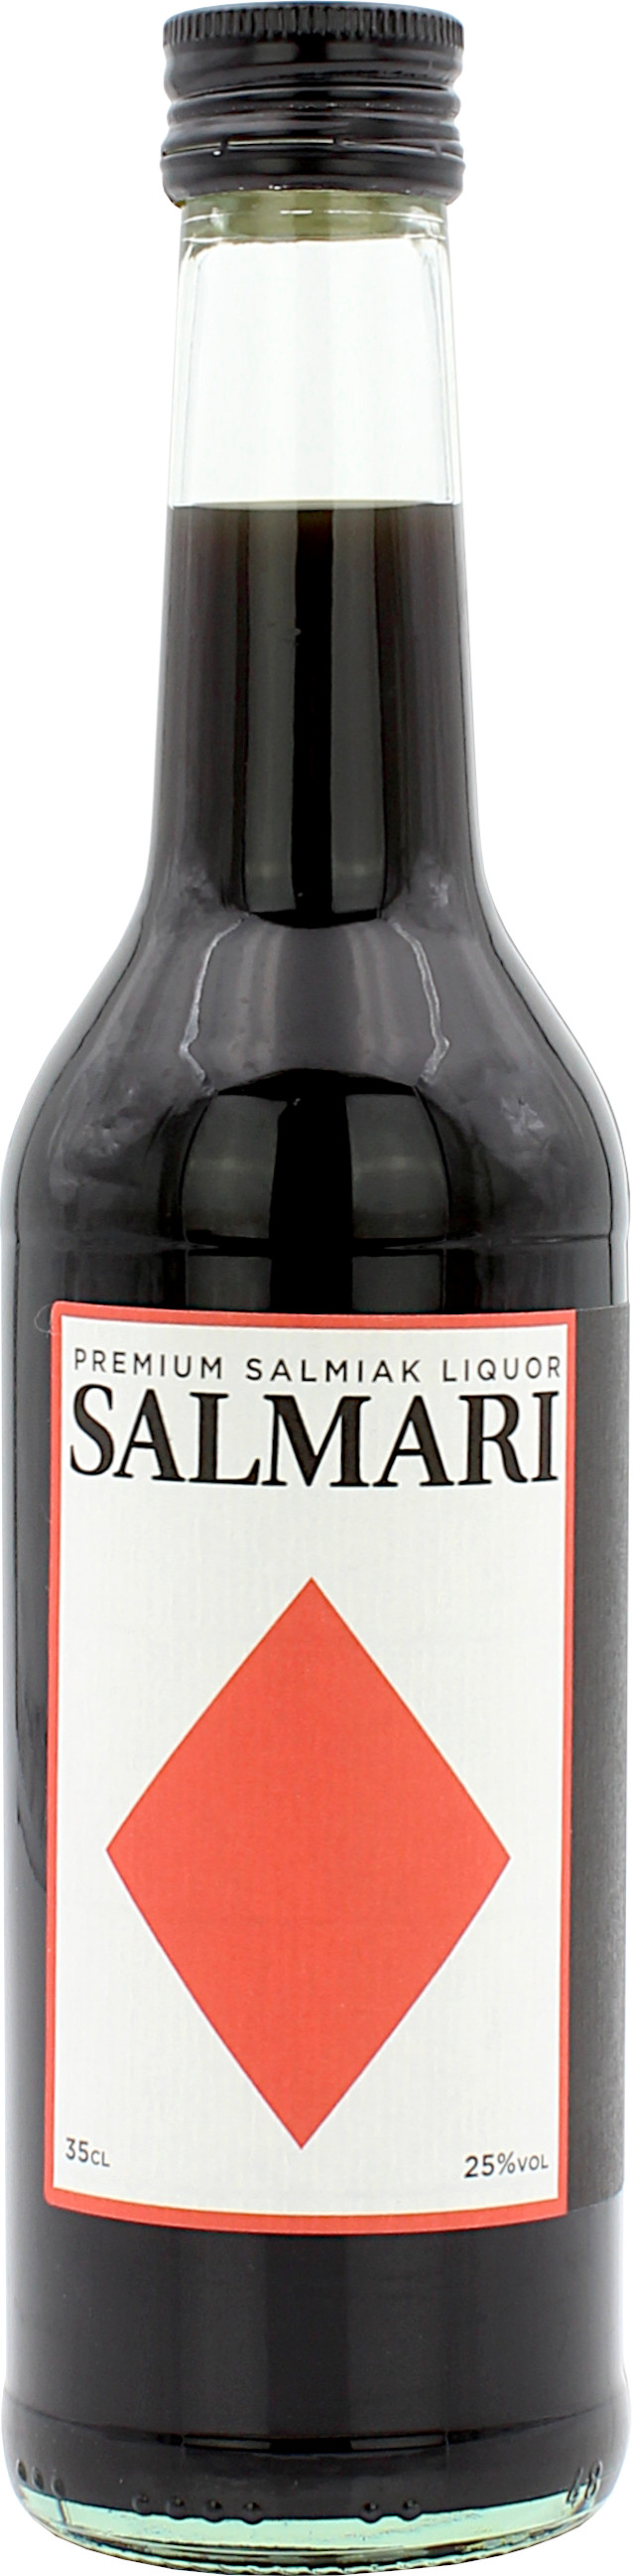 Salmari Premium Salmiak Lakritz Likör 25.0% 0,35l